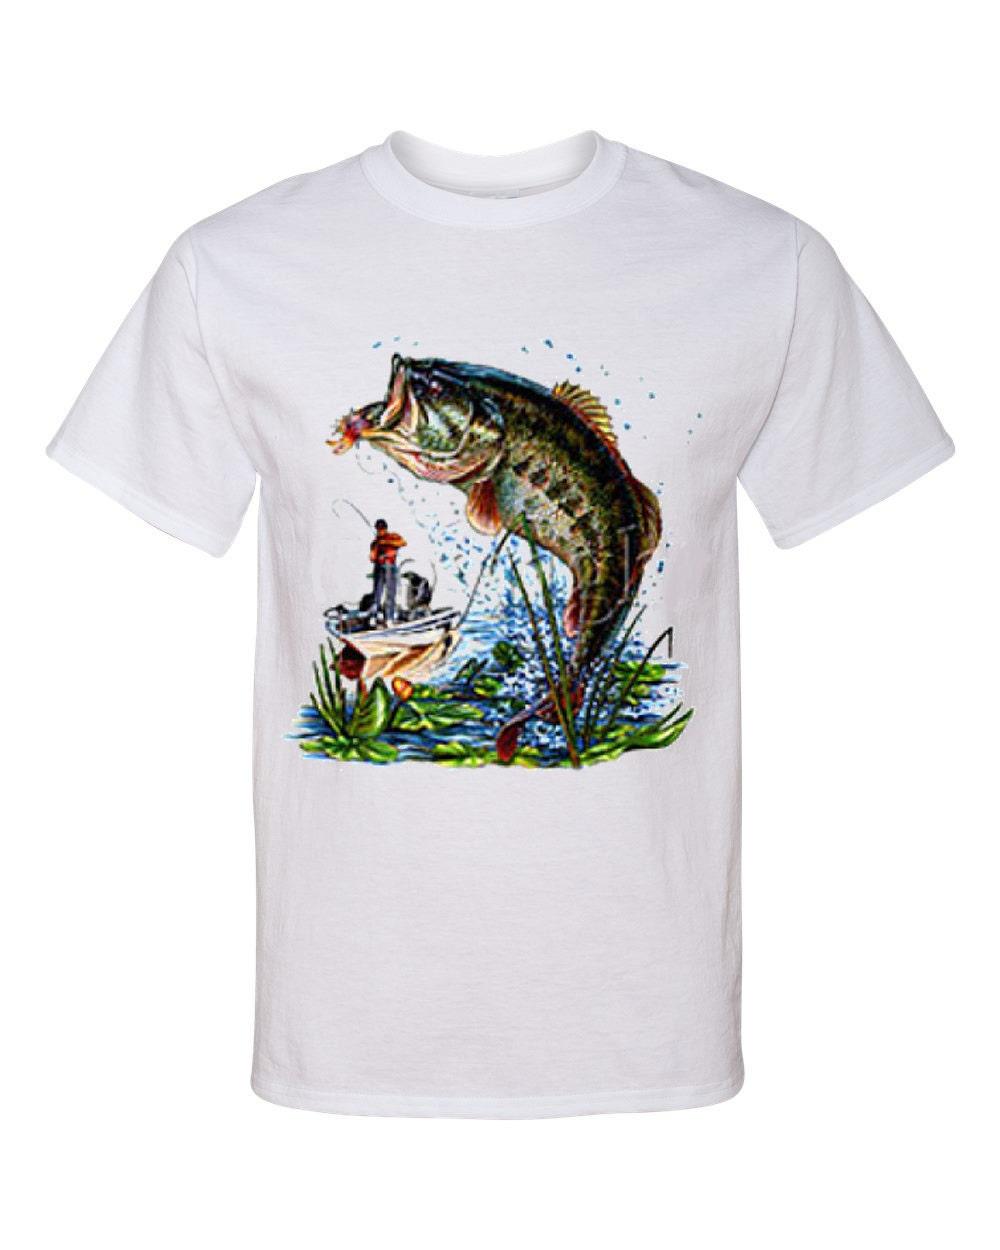 Big mouth bass fishing screen print t shirt by for Big fish screen printing